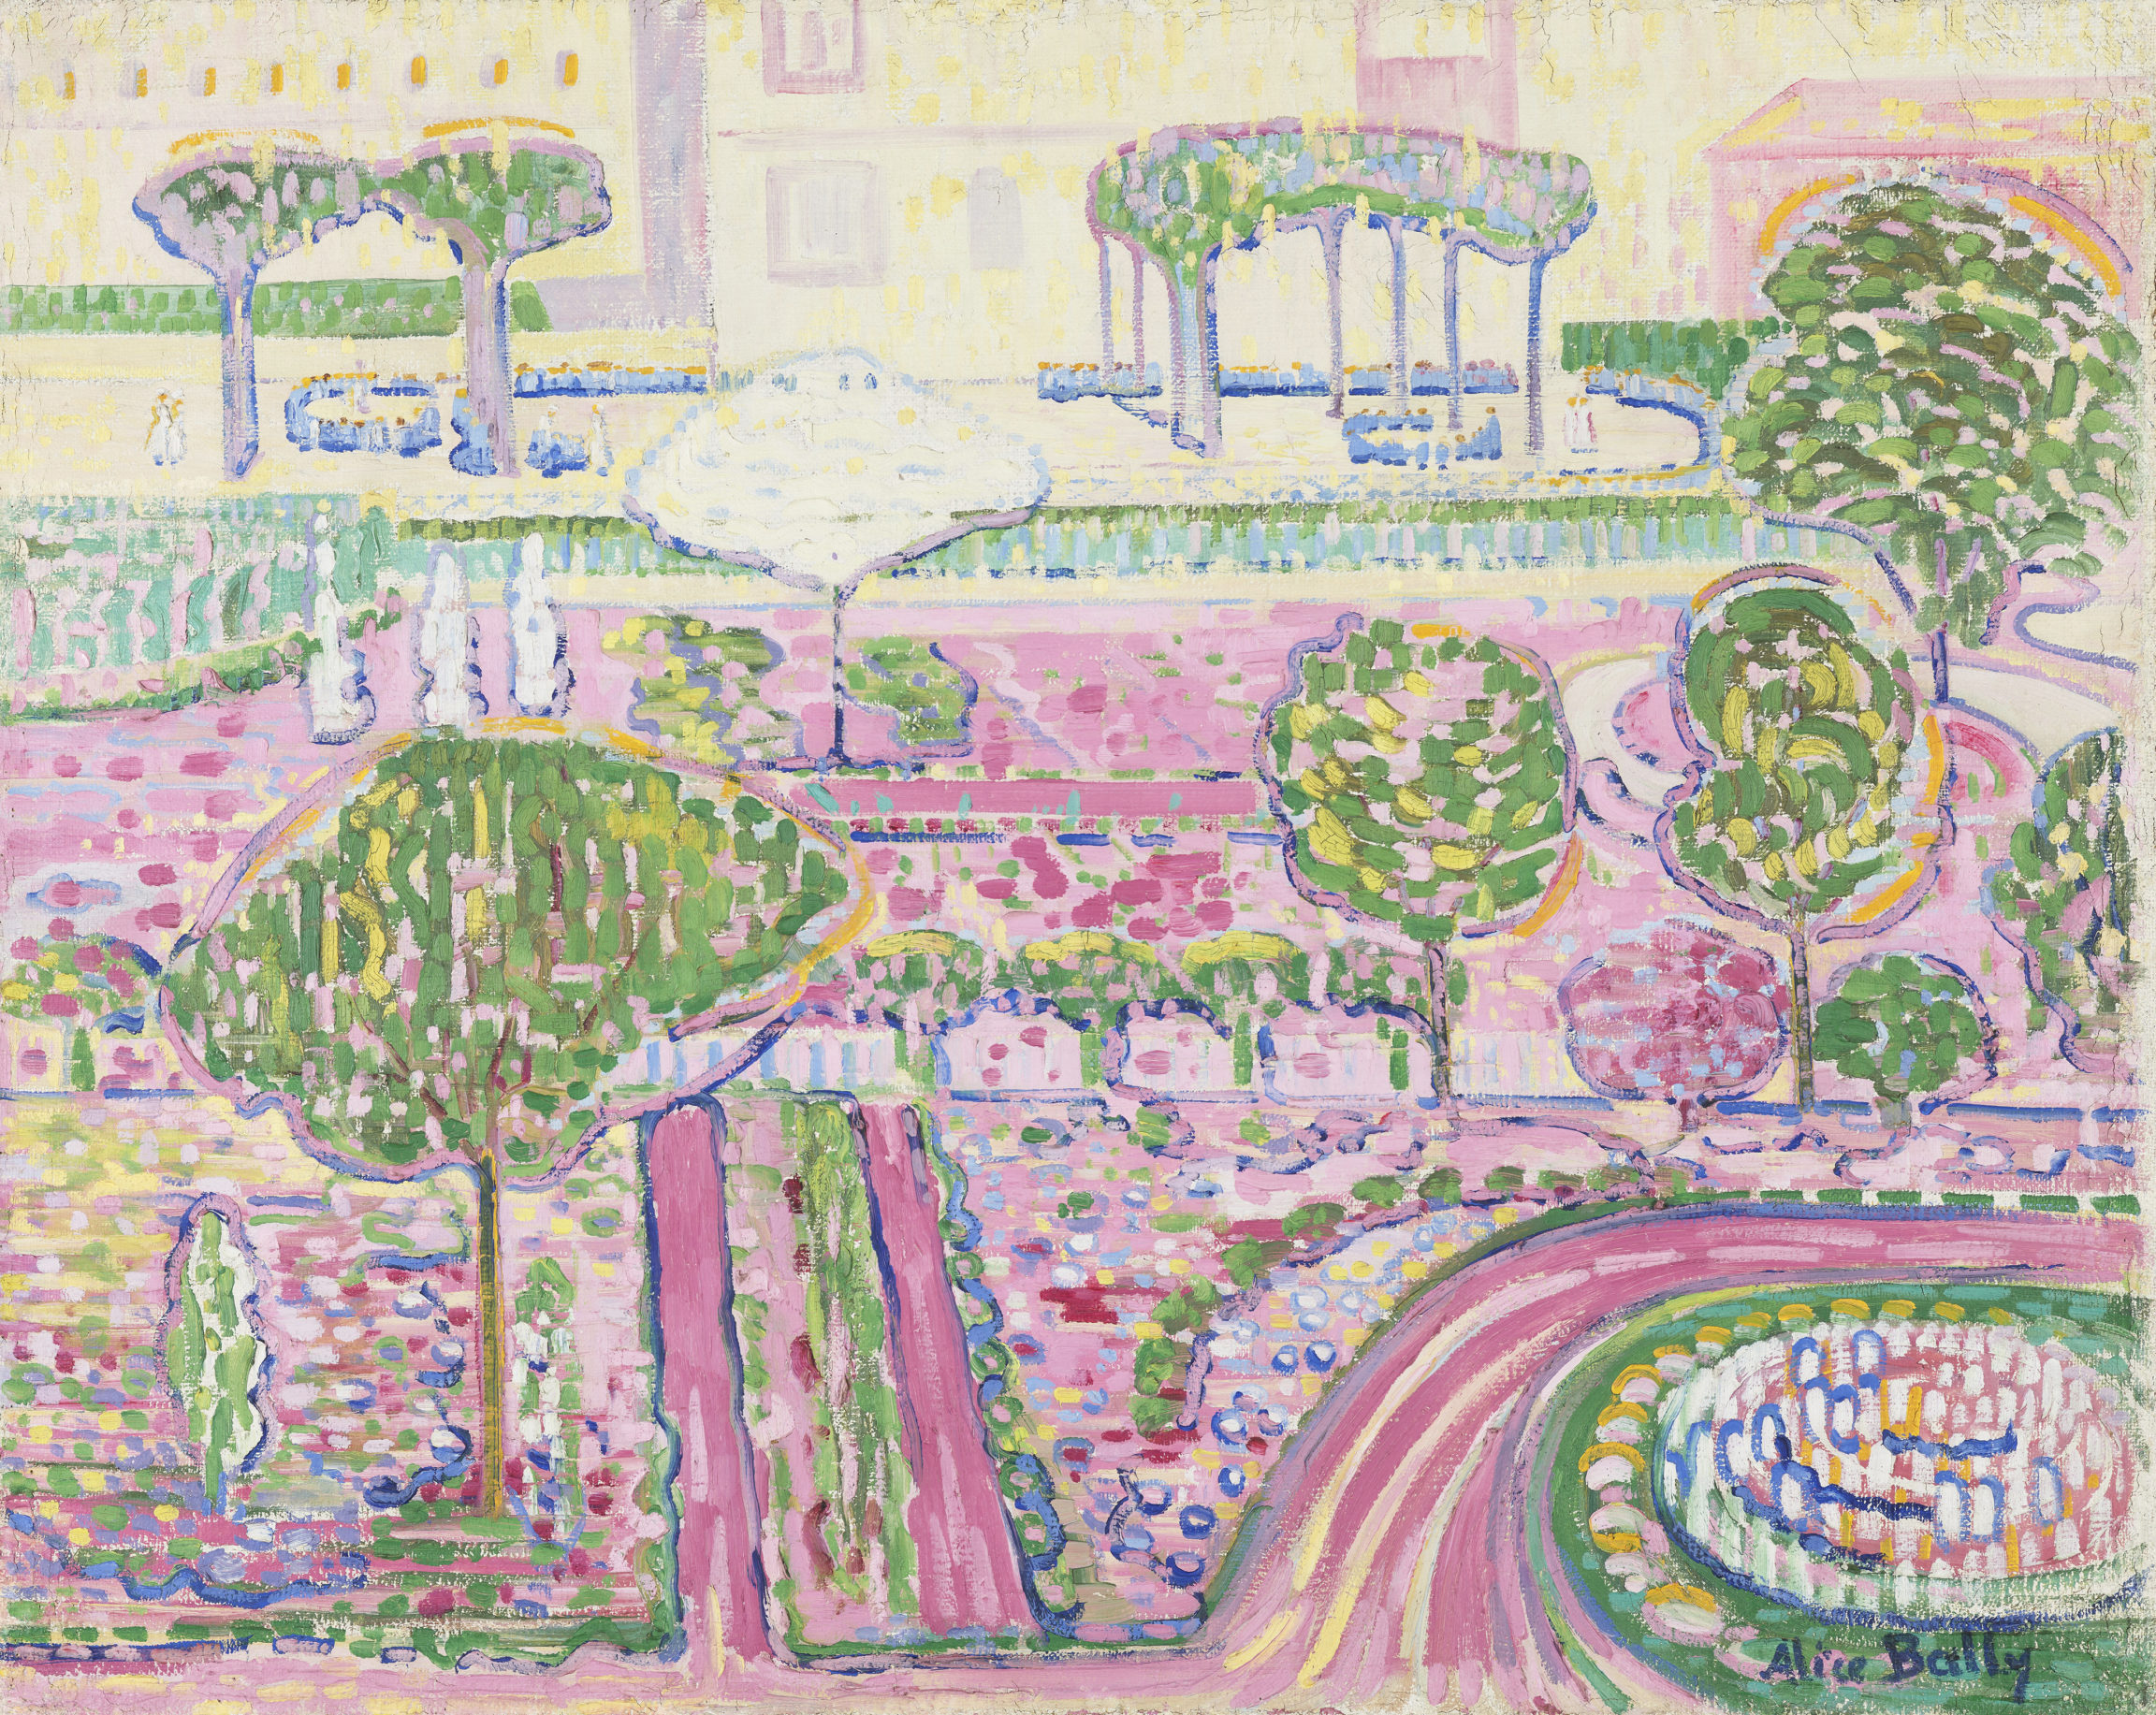 Alice Bailly, Le jardin rose, 1907